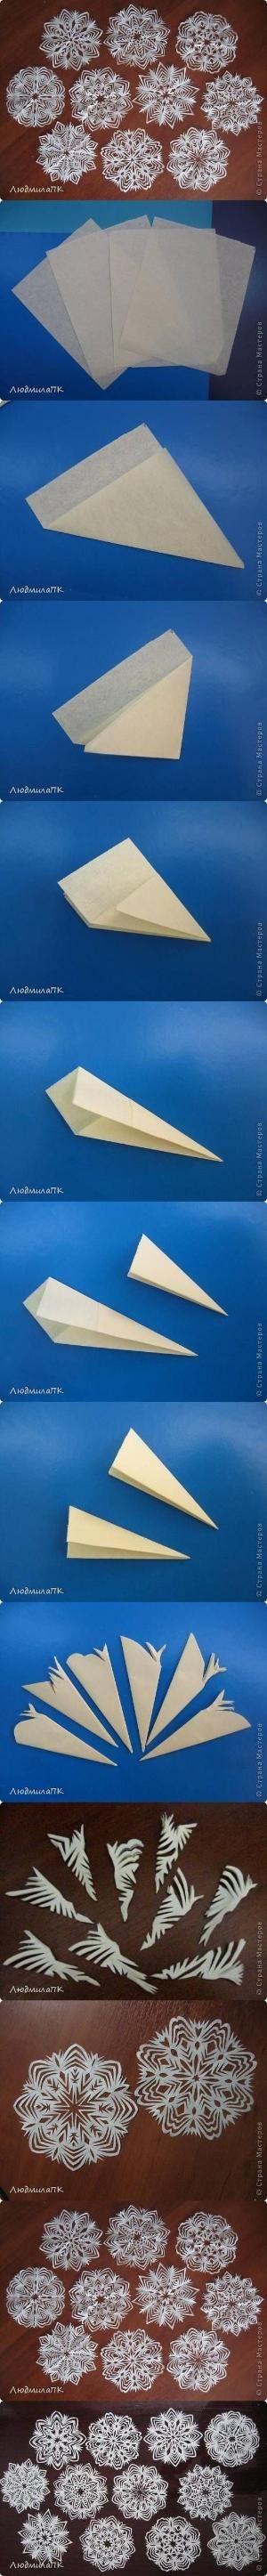 DIY Making Paper Snowflake Method by nwillian